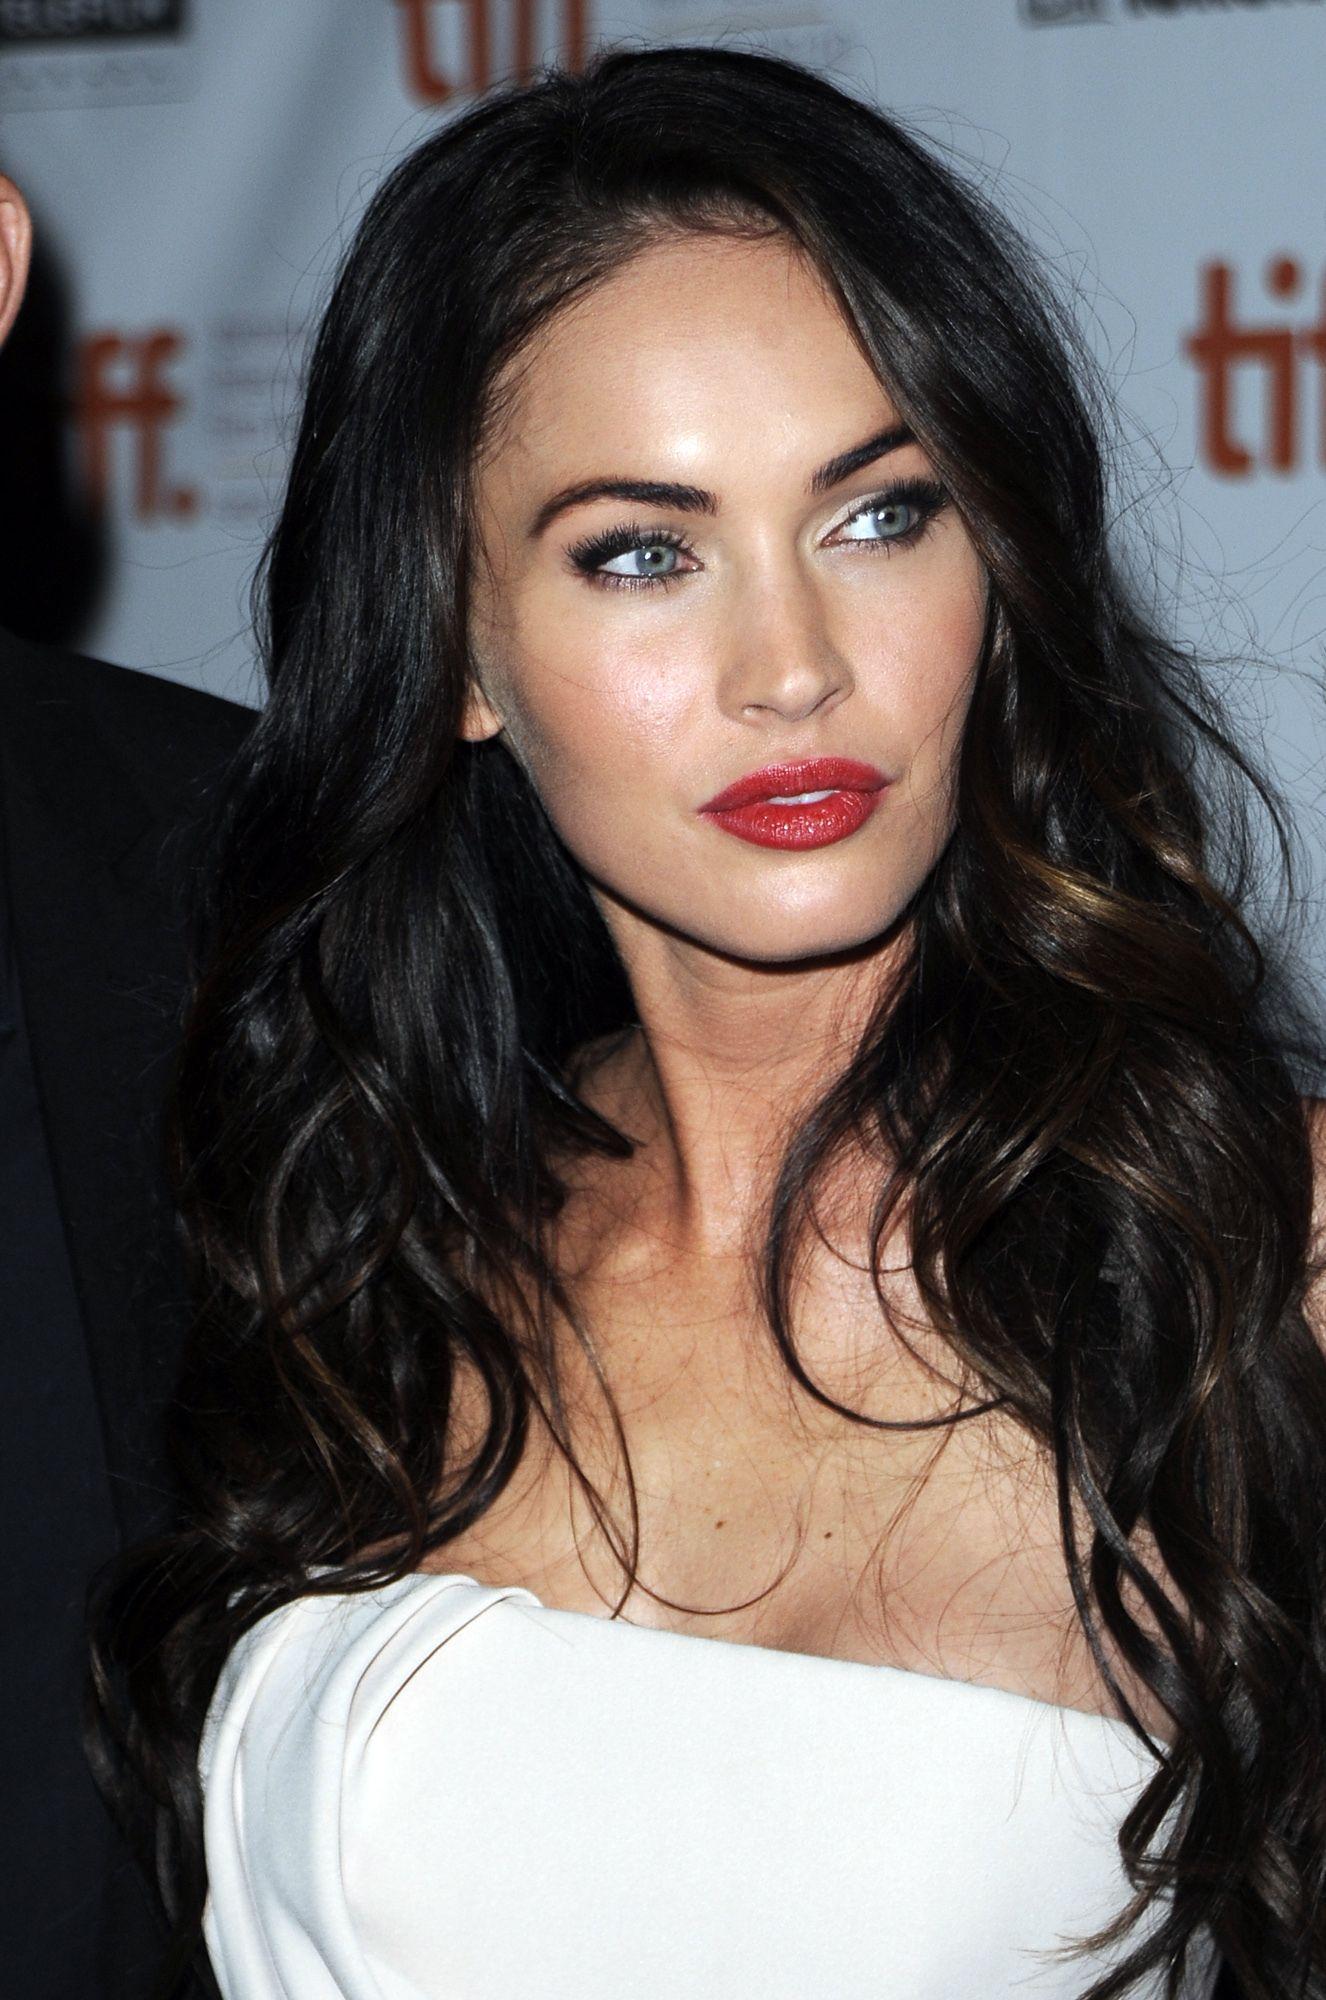 Megan Fox Megan Fox Hair Hairstyle Megan Fox